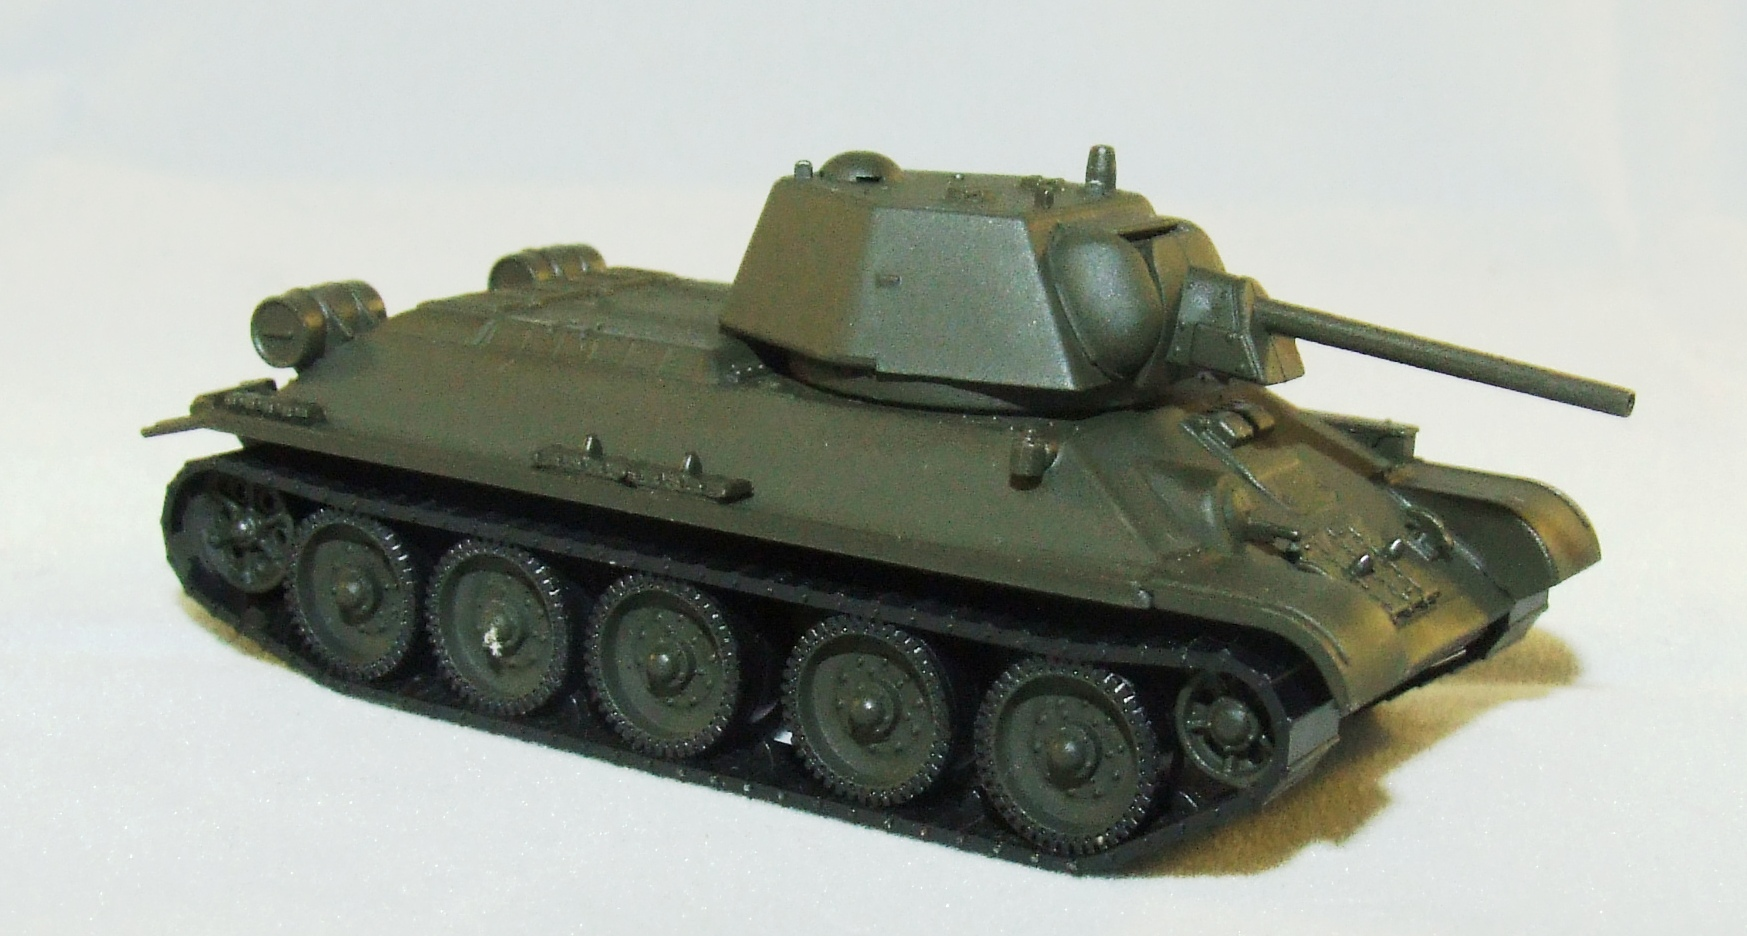 745567  Herpa Military Kampfpanzer T 34-76 SU NVA WP 1:87